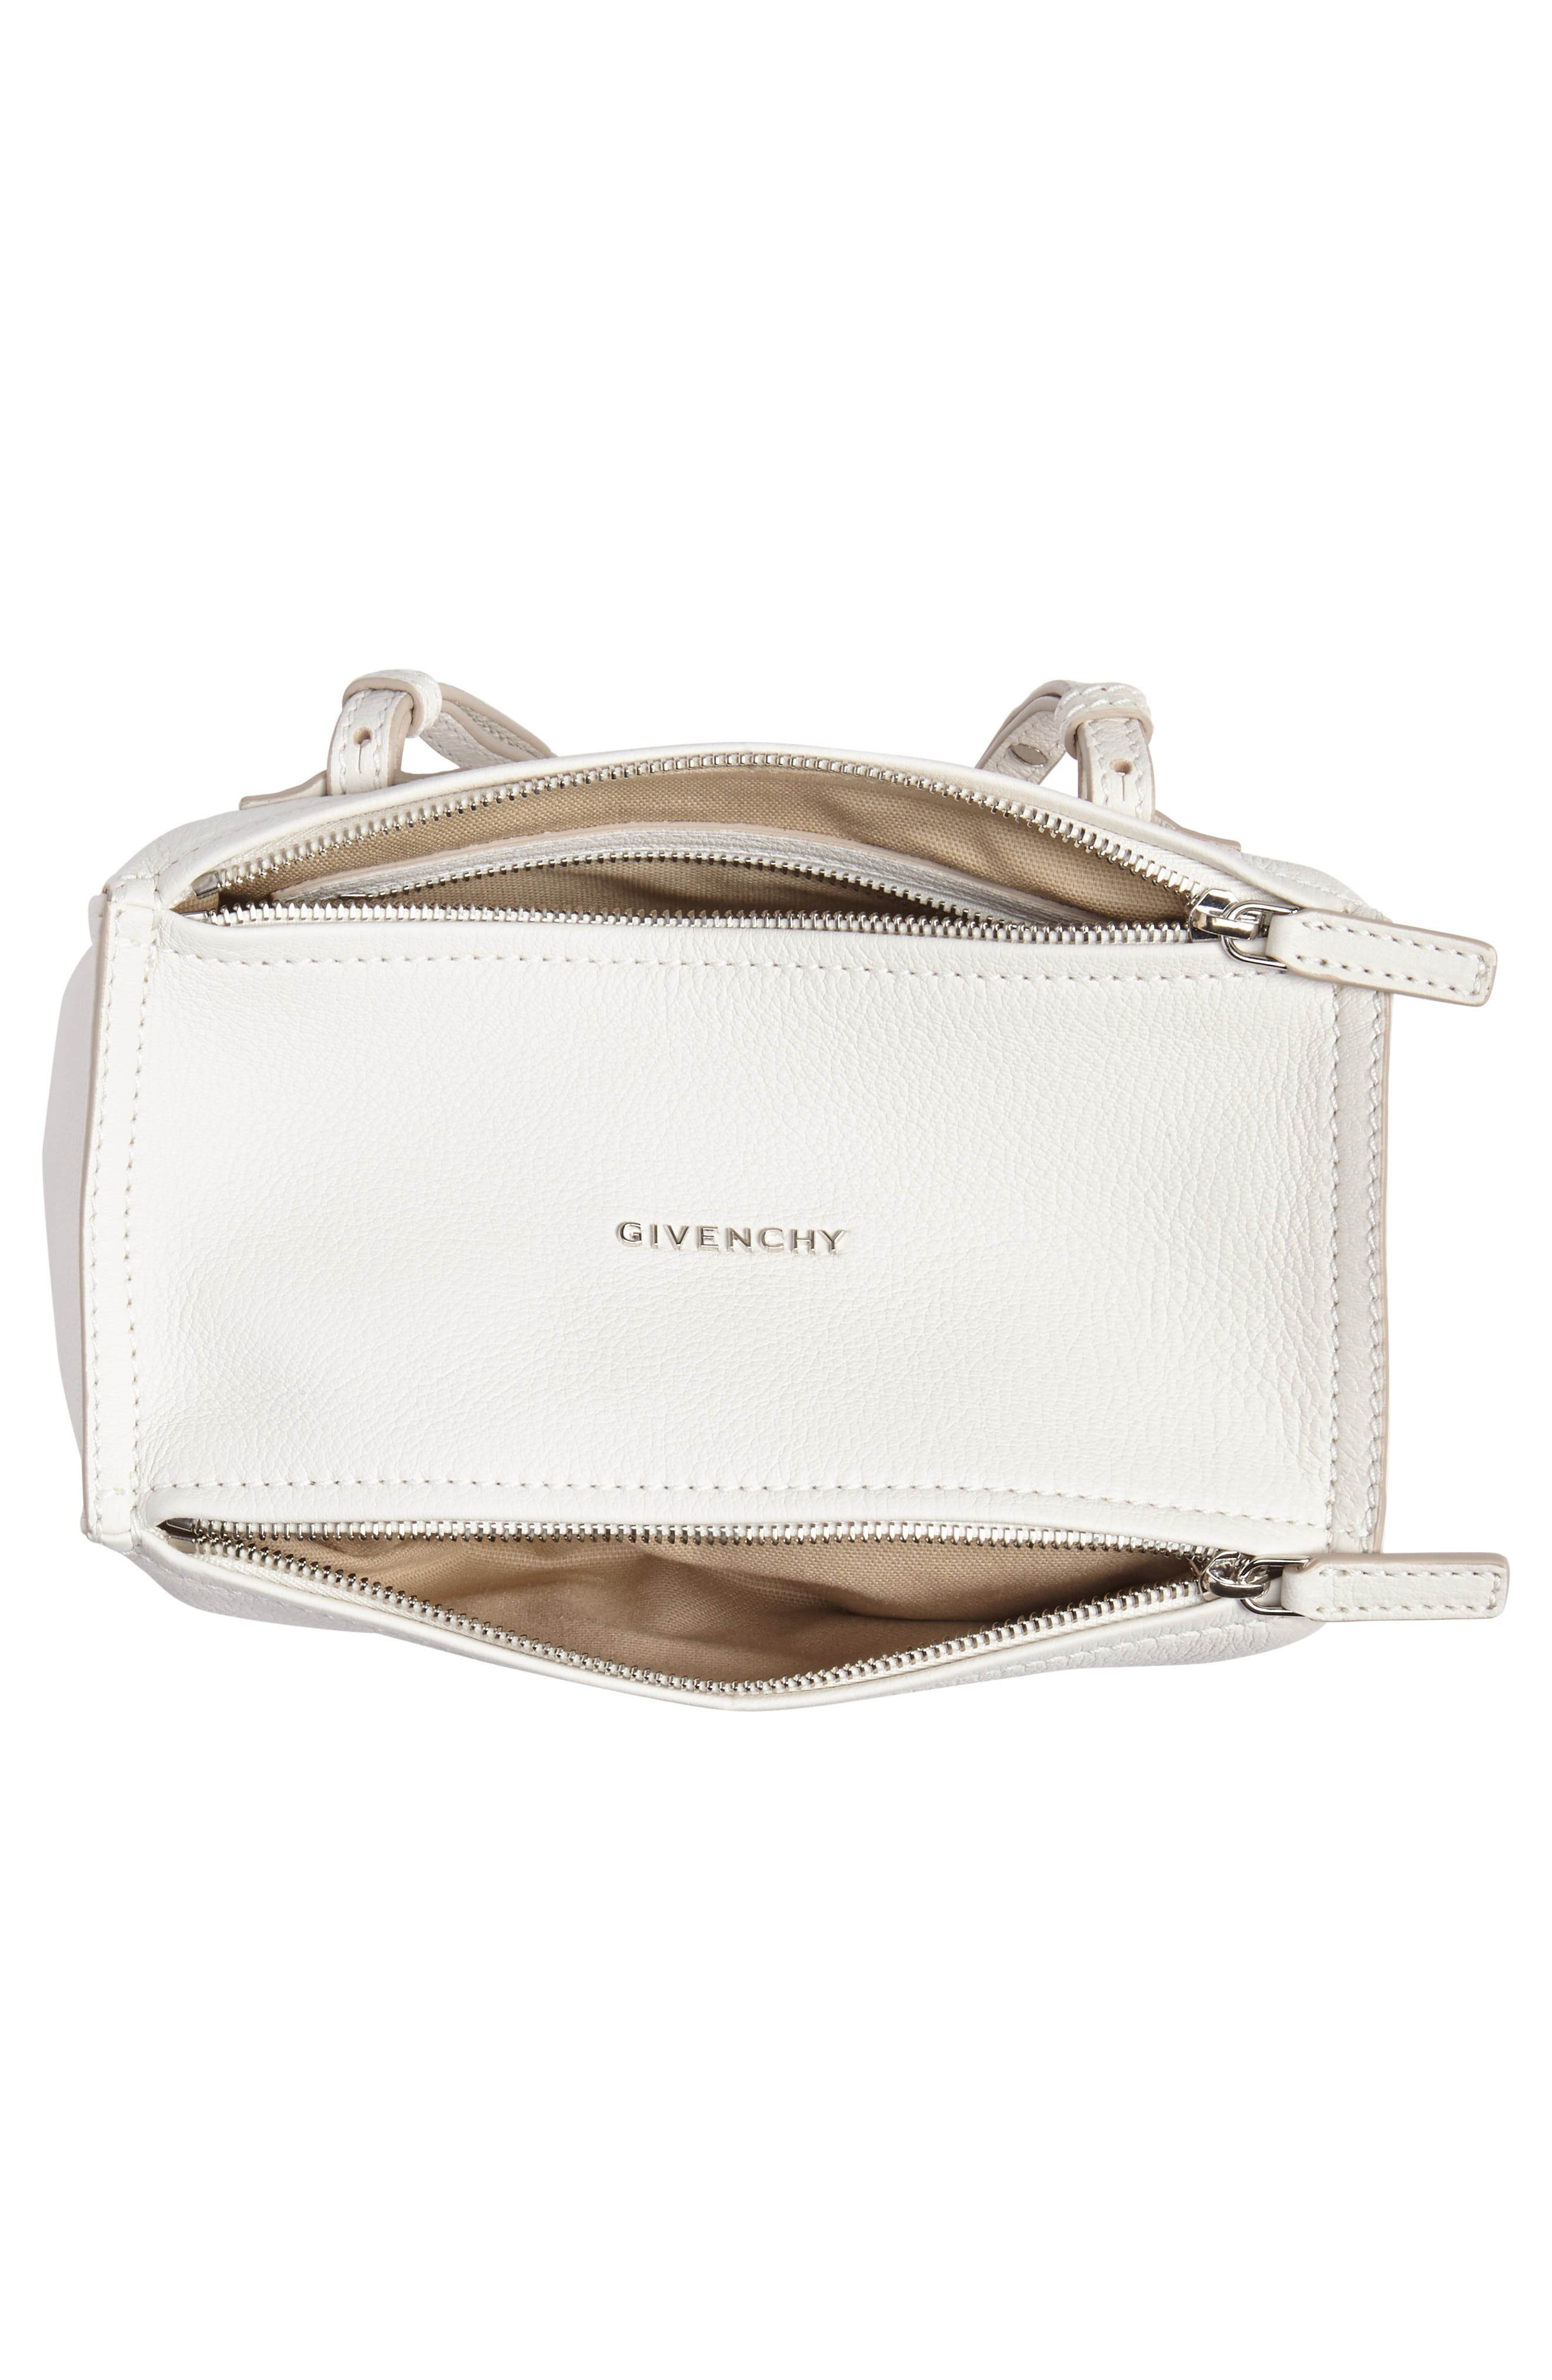 'Mini Pandora' Sugar Leather Shoulder Bag,                             Alternate thumbnail 4, color,                             WHITE